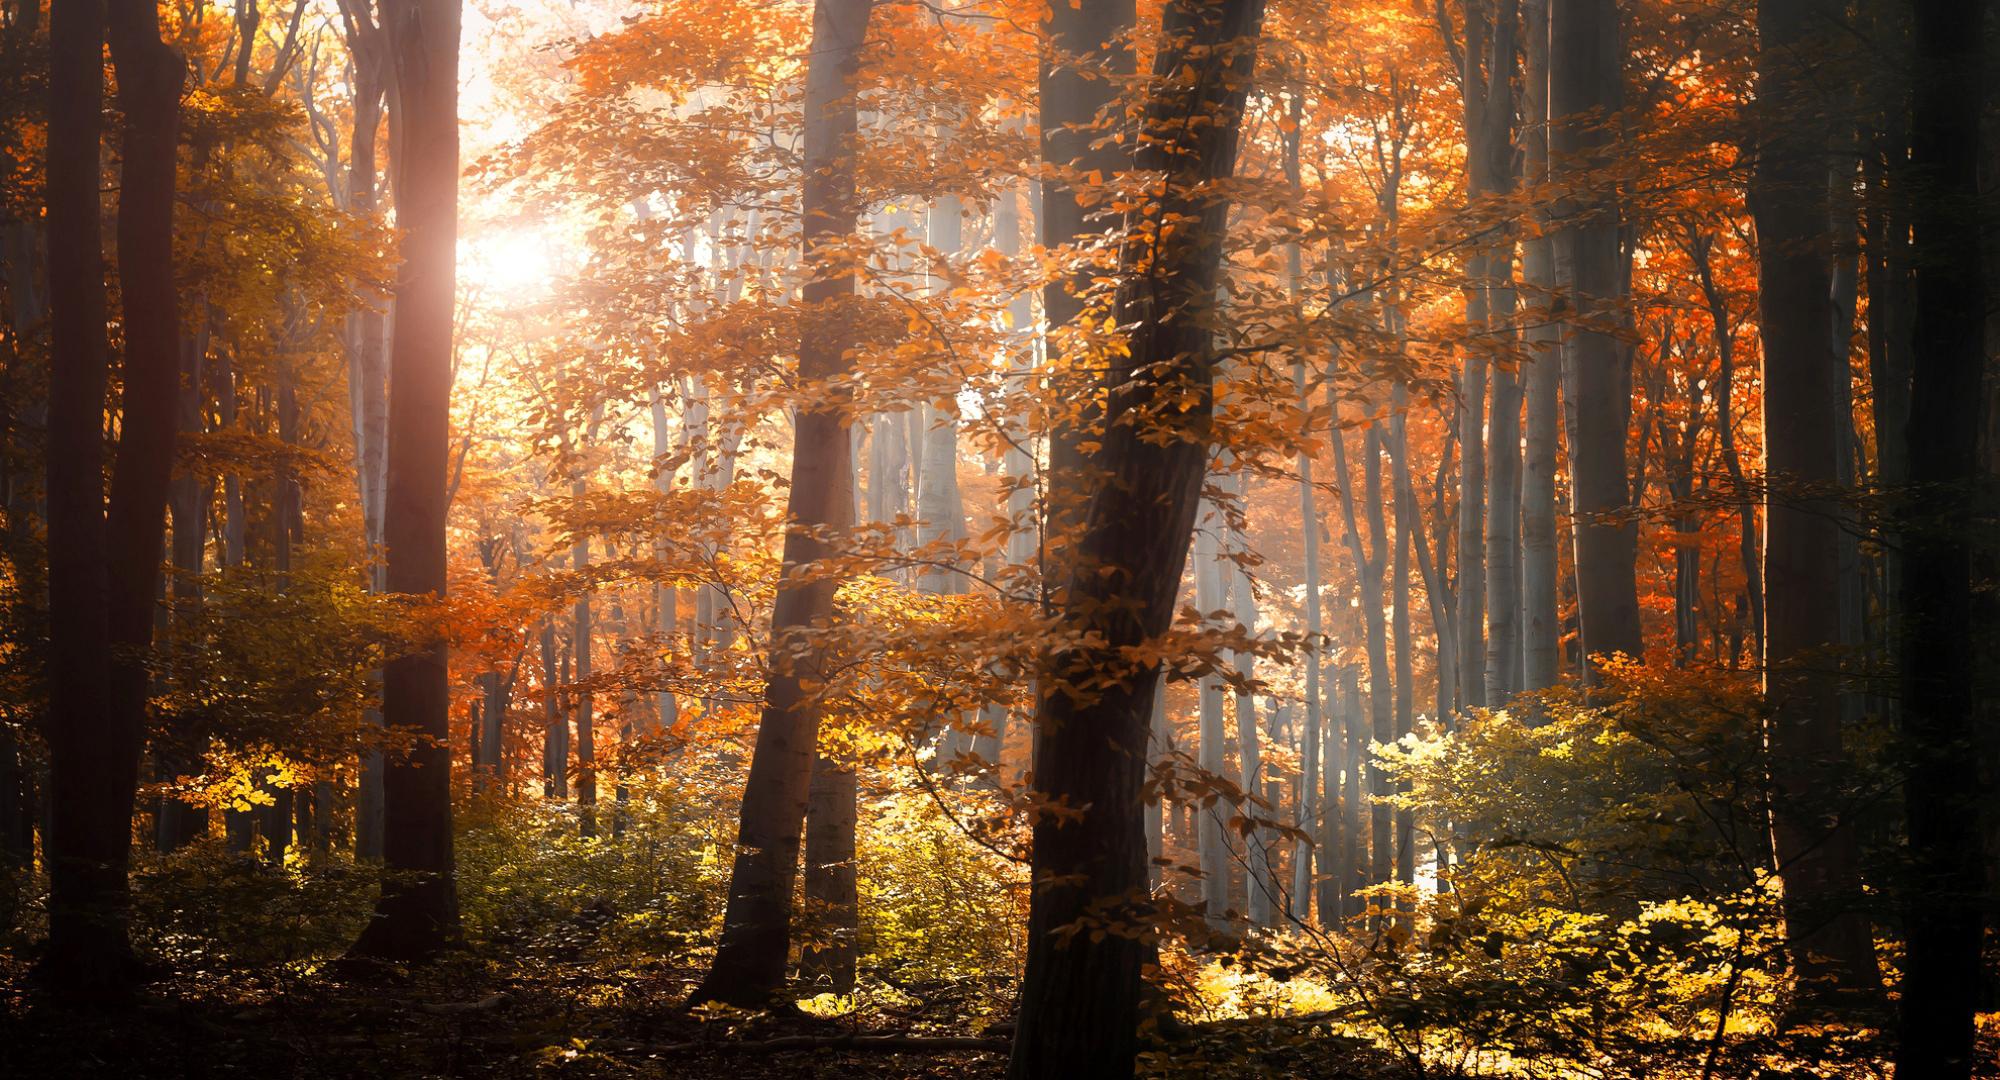 Forest autumn foliage trees leaves orange yellow light ...